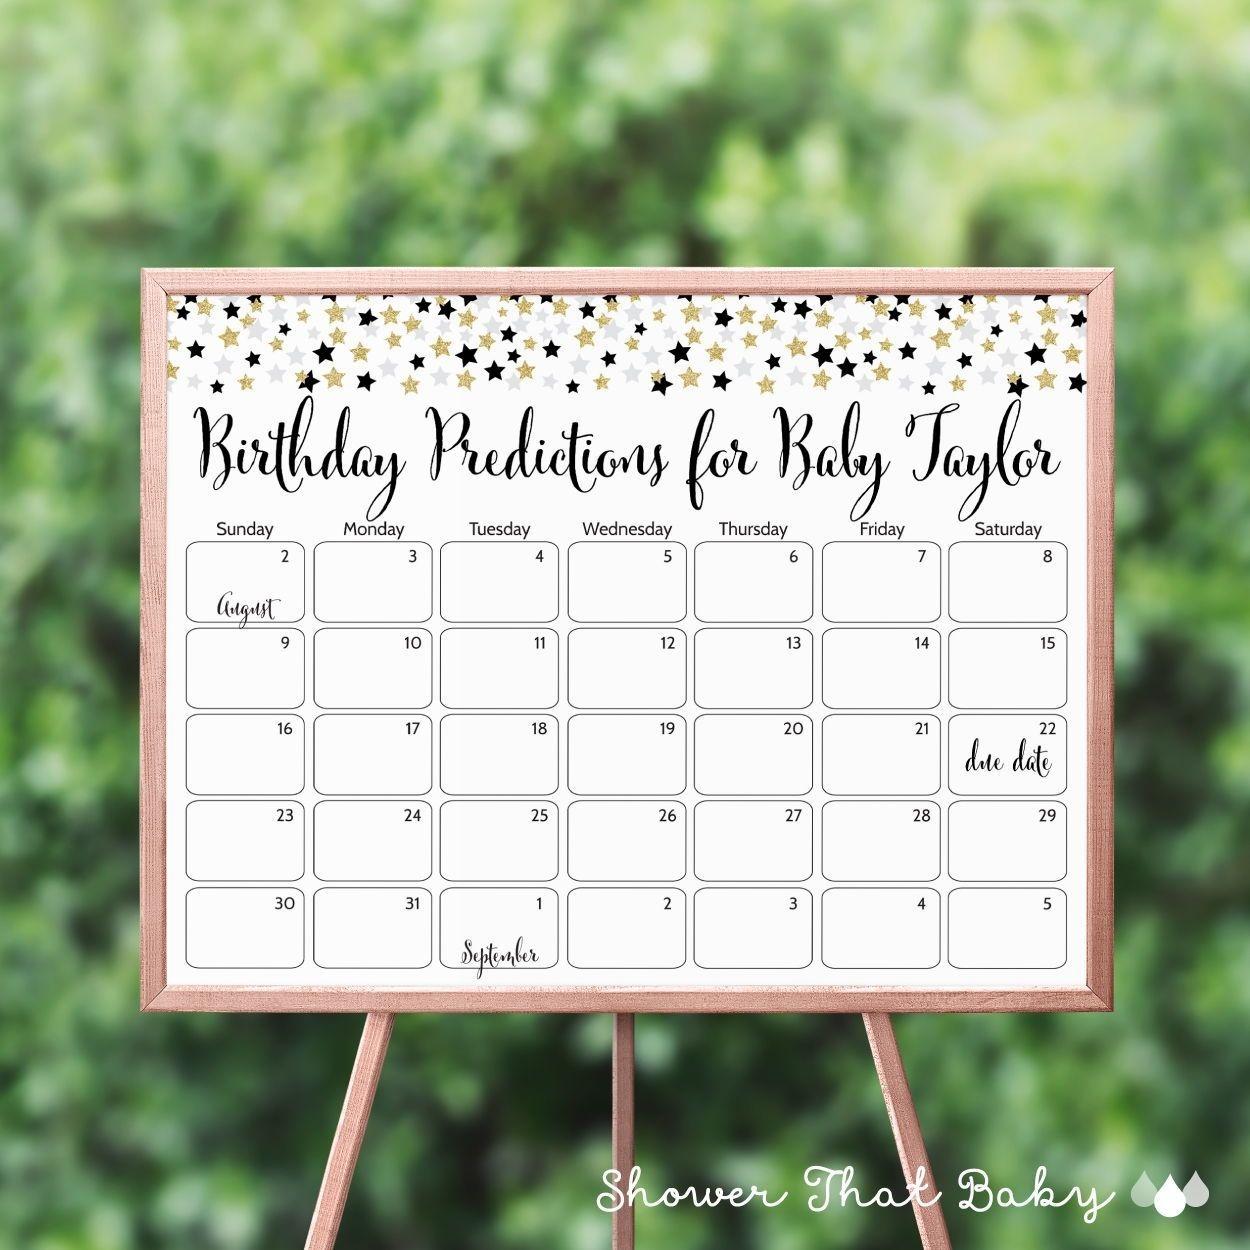 Star Baby Shower Birthday Predictions - Printable Baby